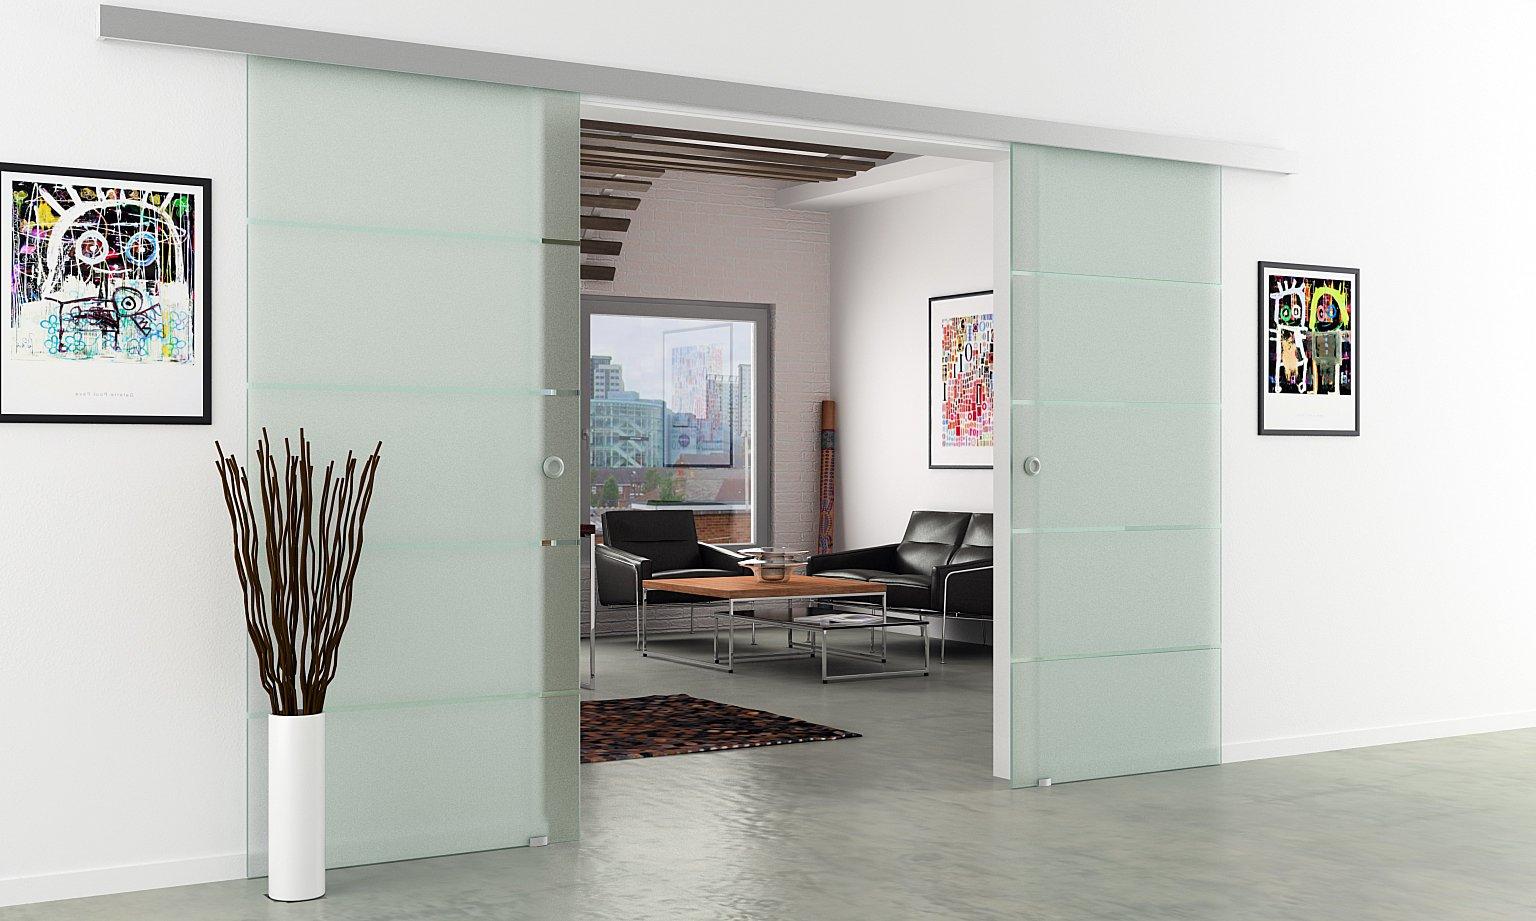 Correderas de cristal de puerta de planta | Anchura total: 1550 mm - Altura total: 2050 mm | Vidrio satinado con 4 rayas | Tiradores LEVIDOR basic system - protector de pantalla